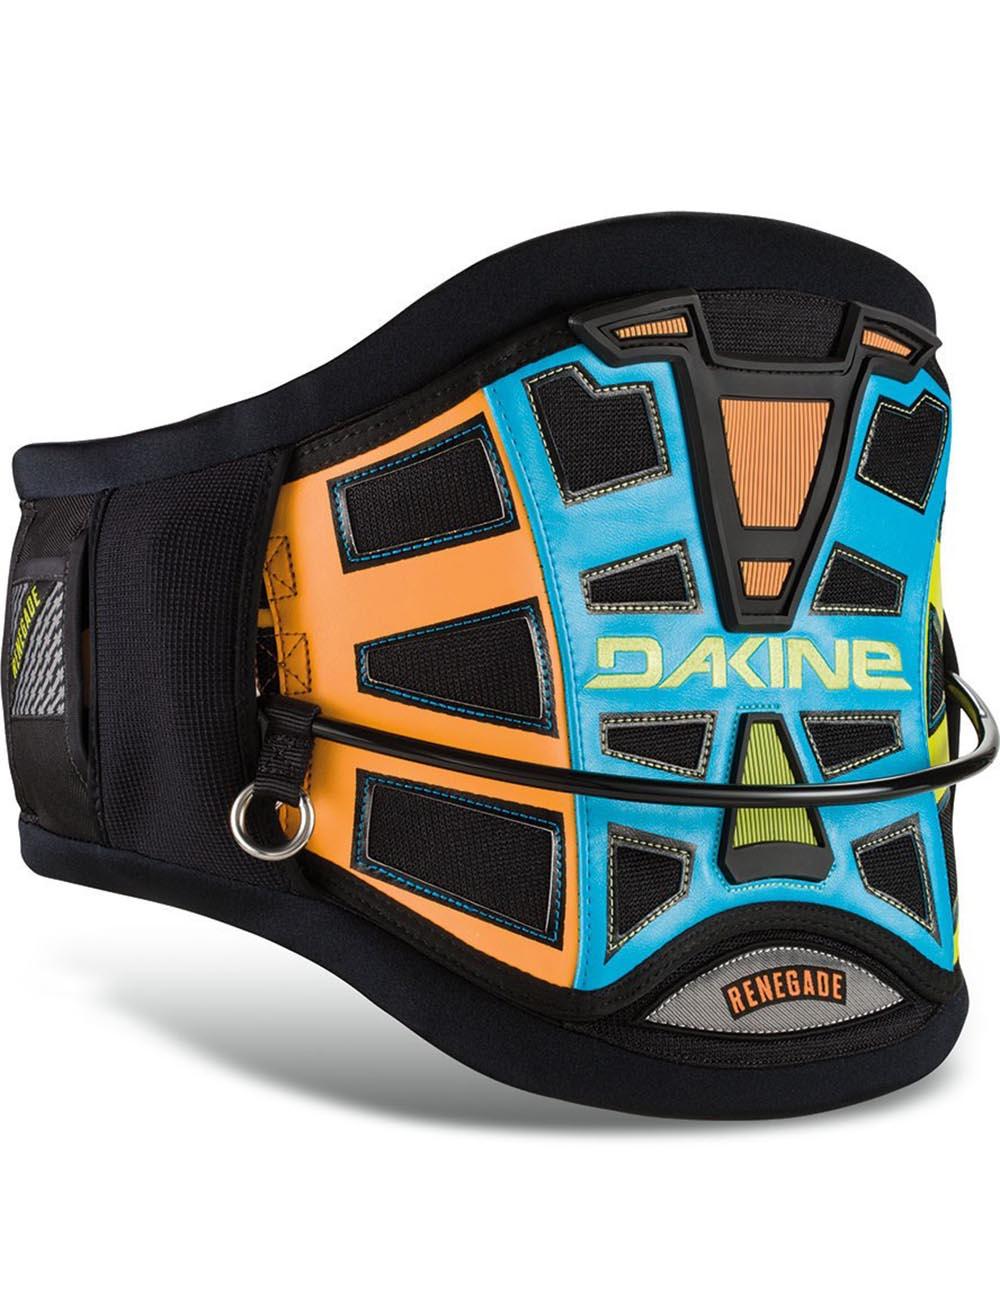 Dakine Renegade Harness - 2XS